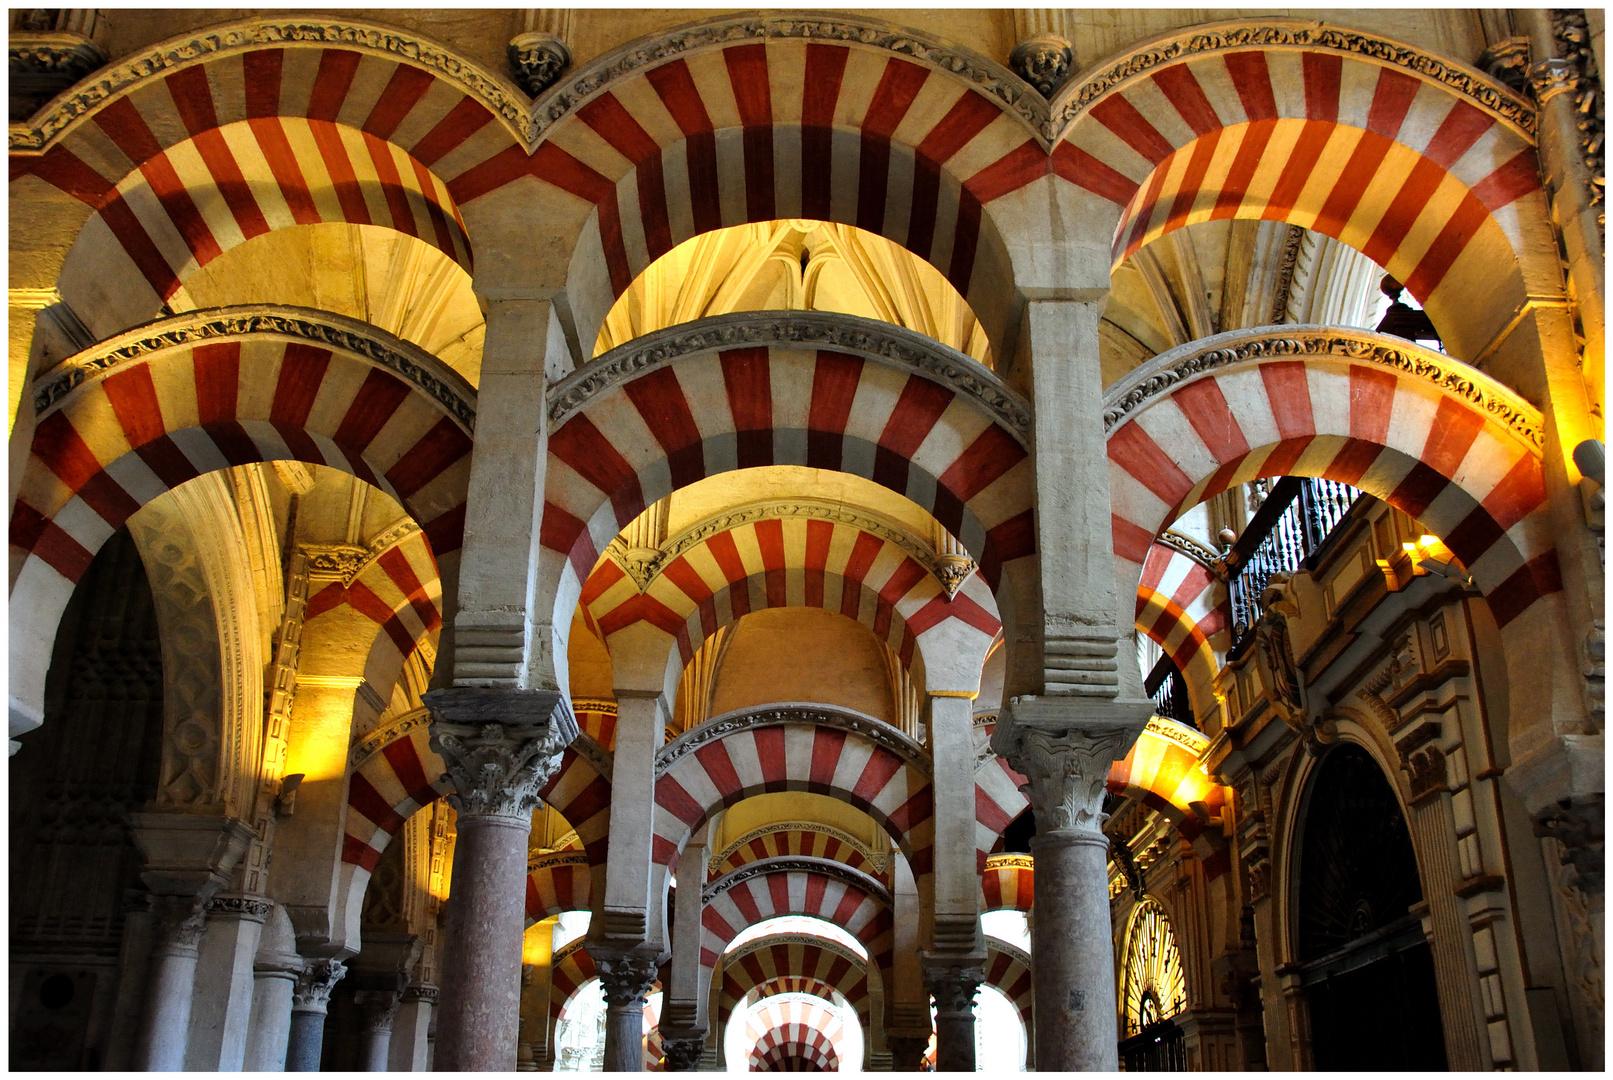 Coroba - In der Mezquita